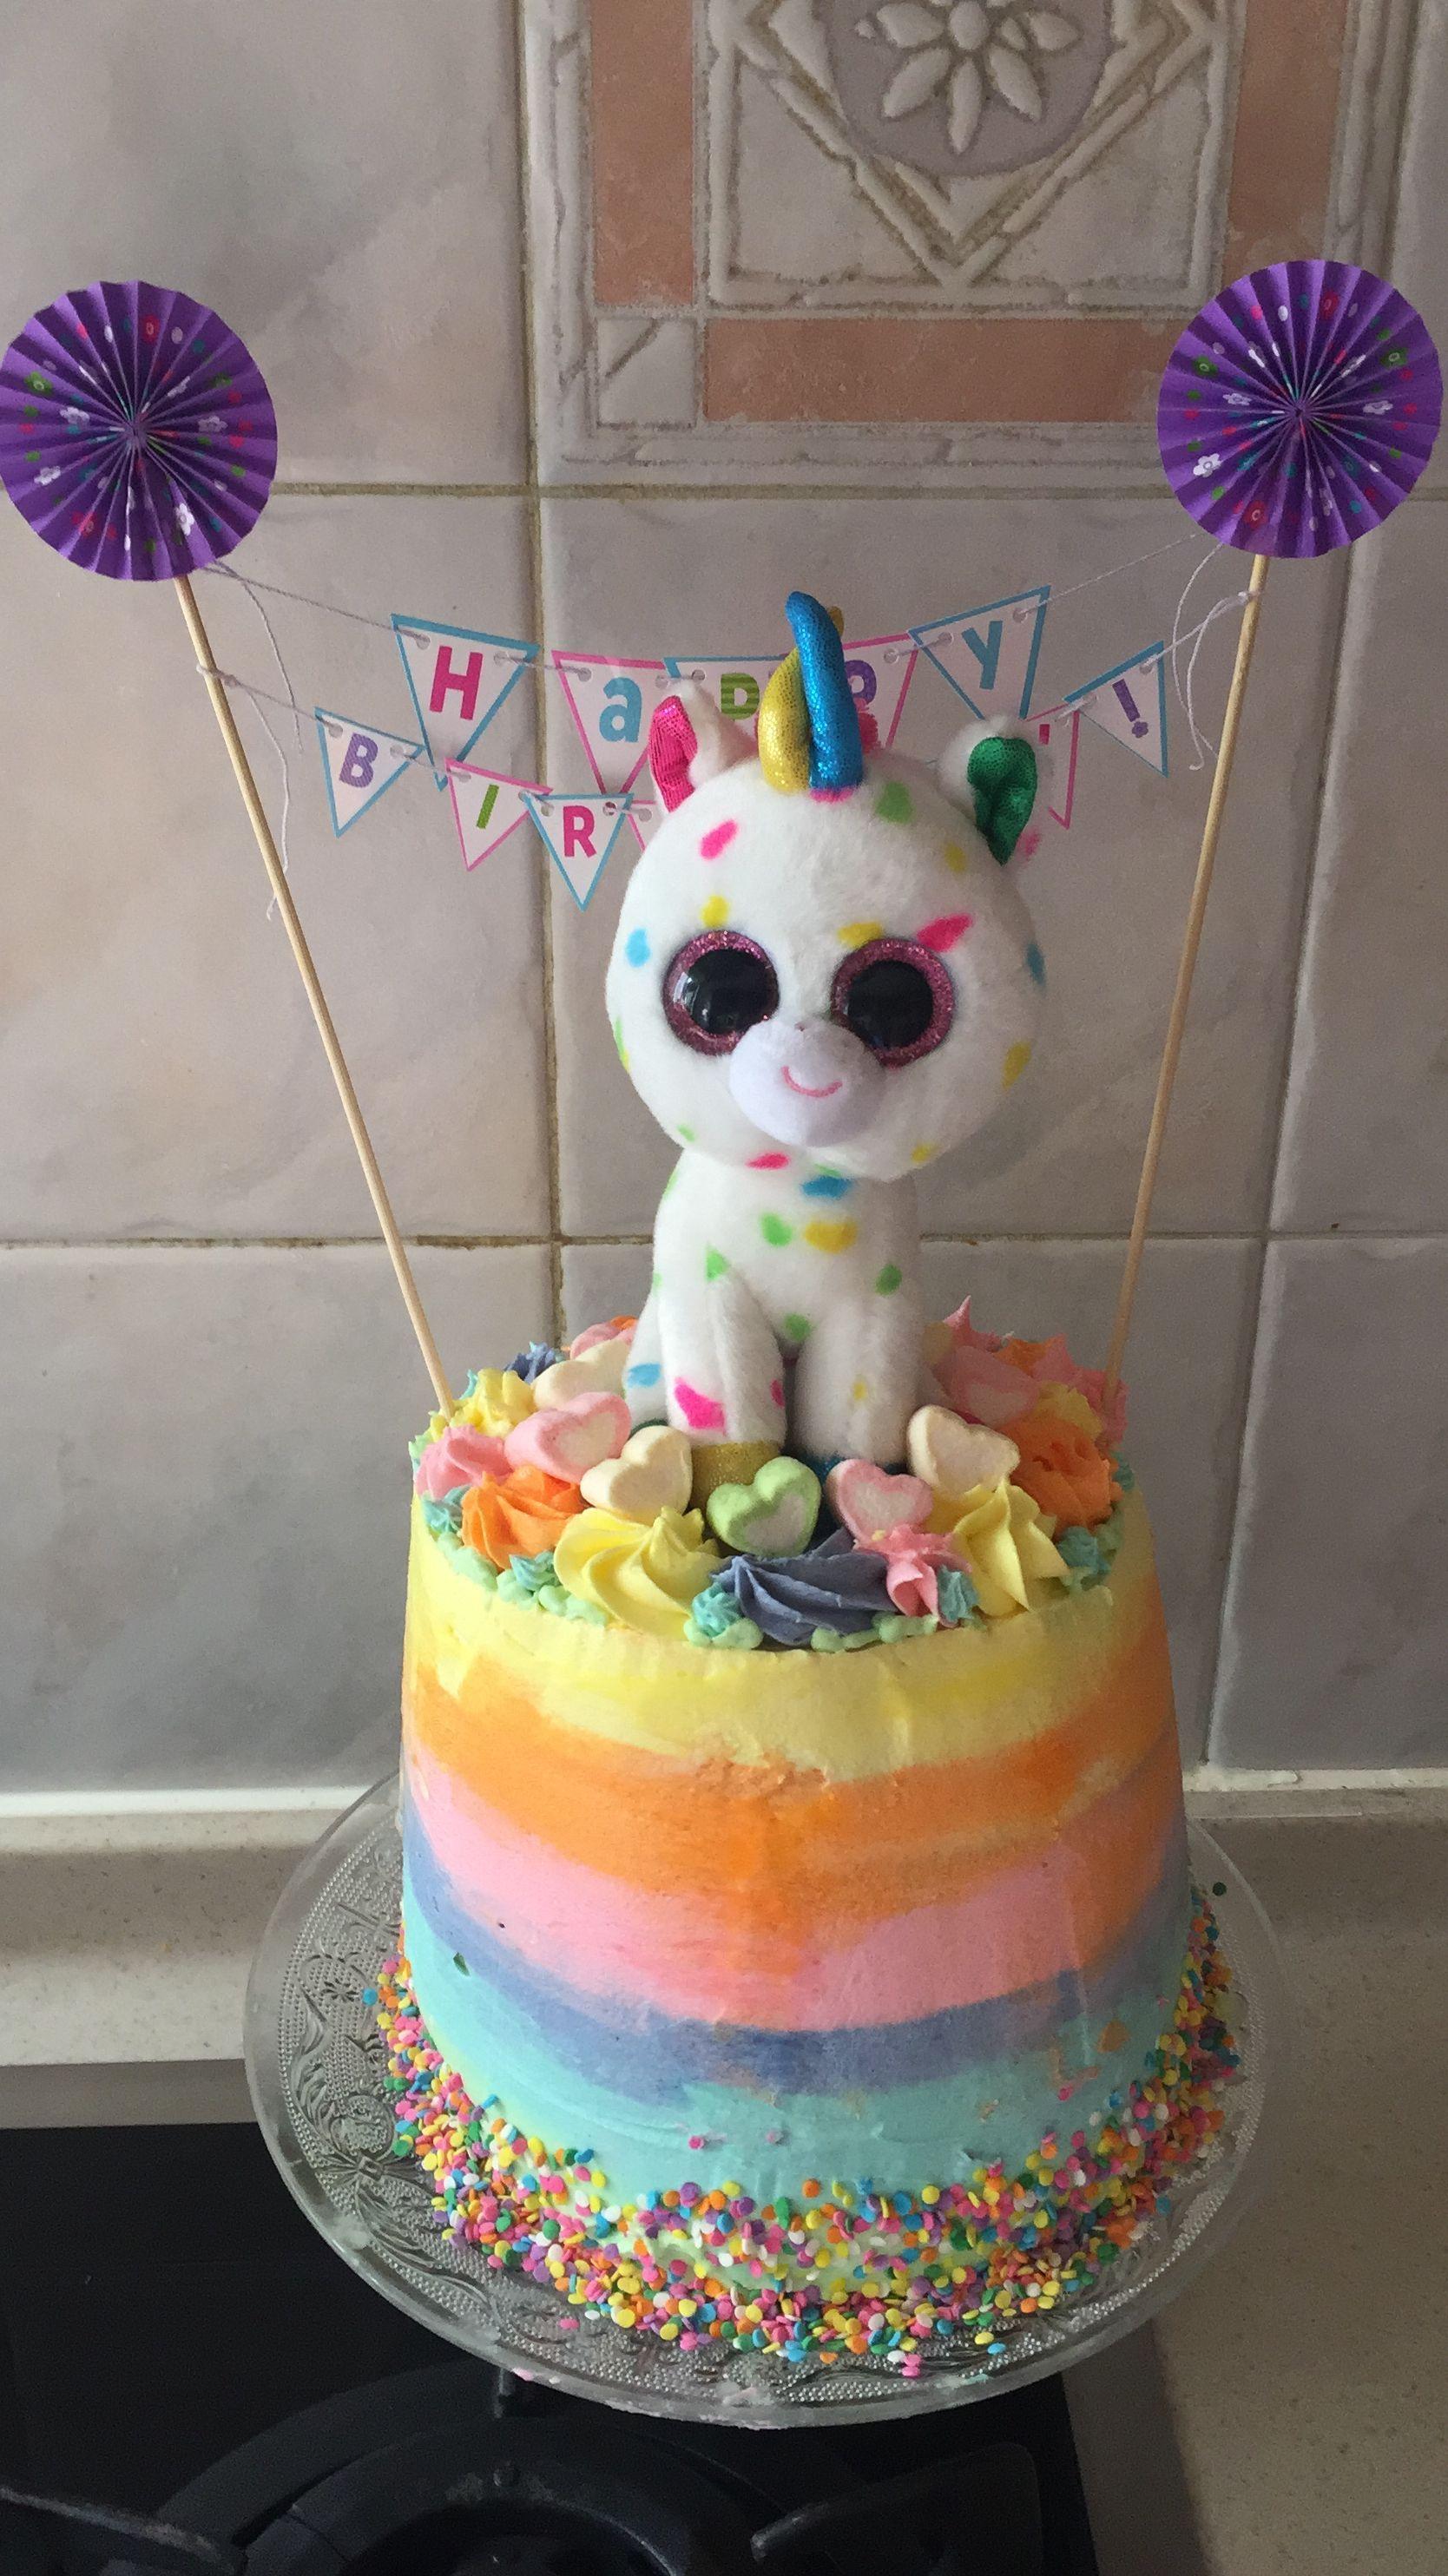 Beanie Boo cake in 2020 | Beanie boo birthdays, Baby ...